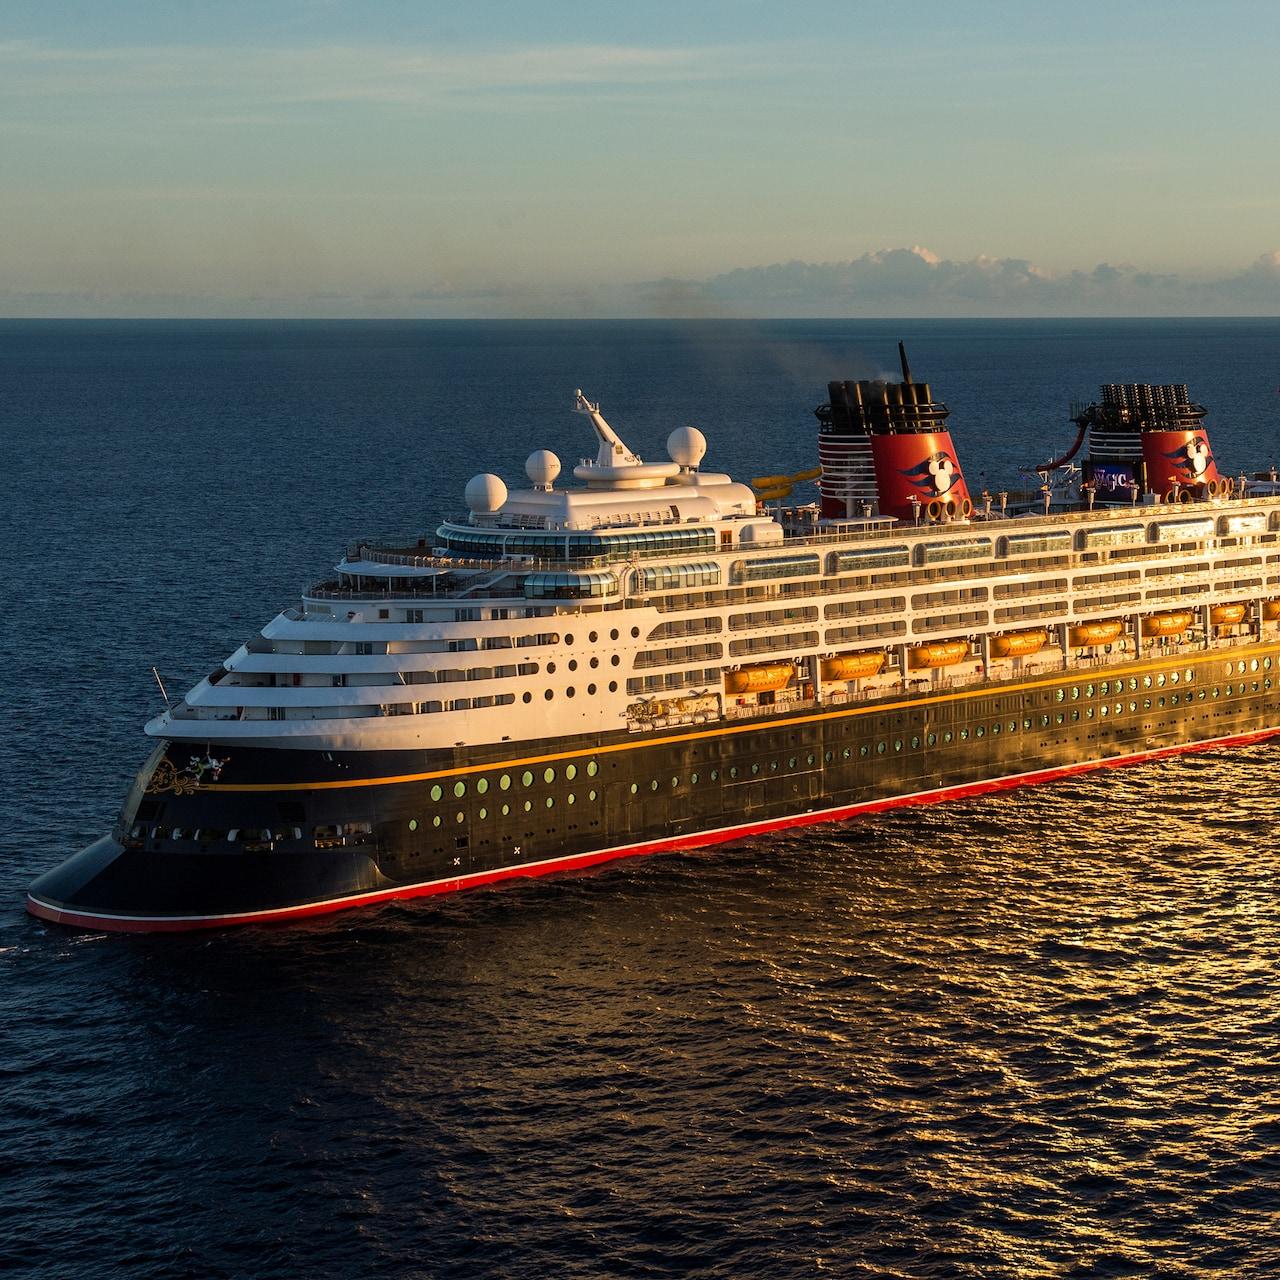 The Disney Cruise Line cruise ship, Disney Magic, sails across the sea